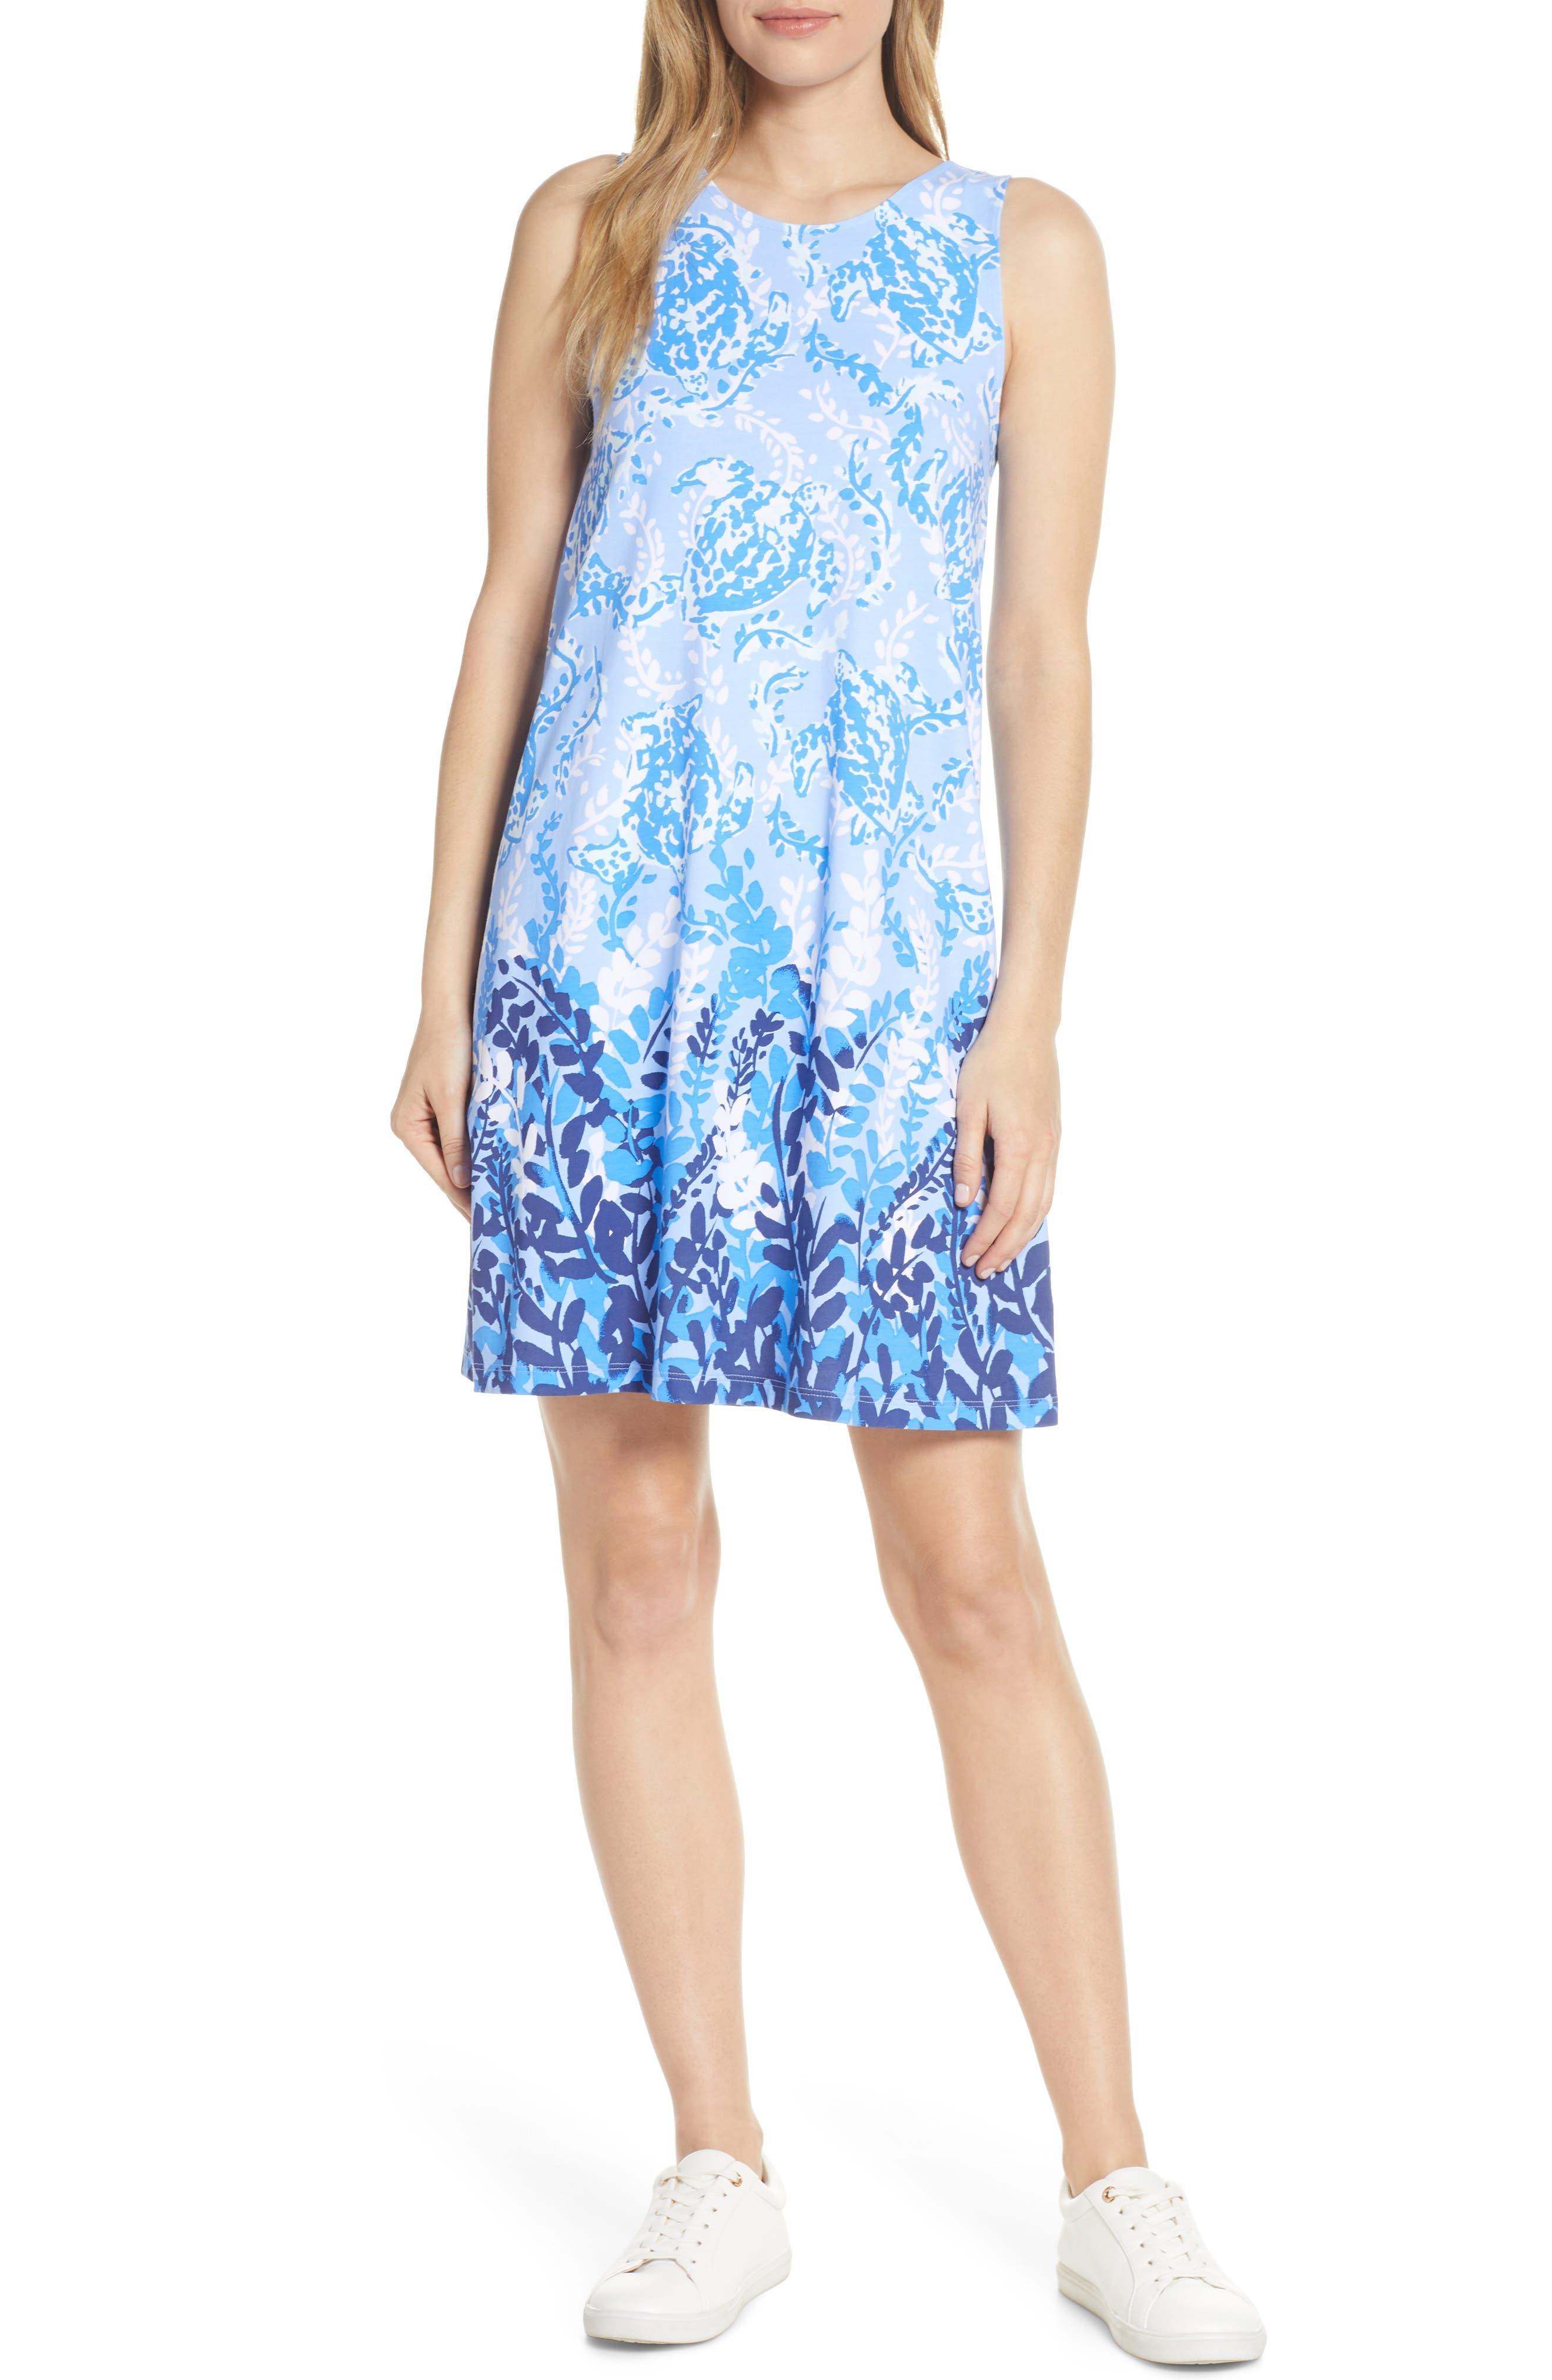 Lilly Pulitzer Kristen Shift Dress, Blue